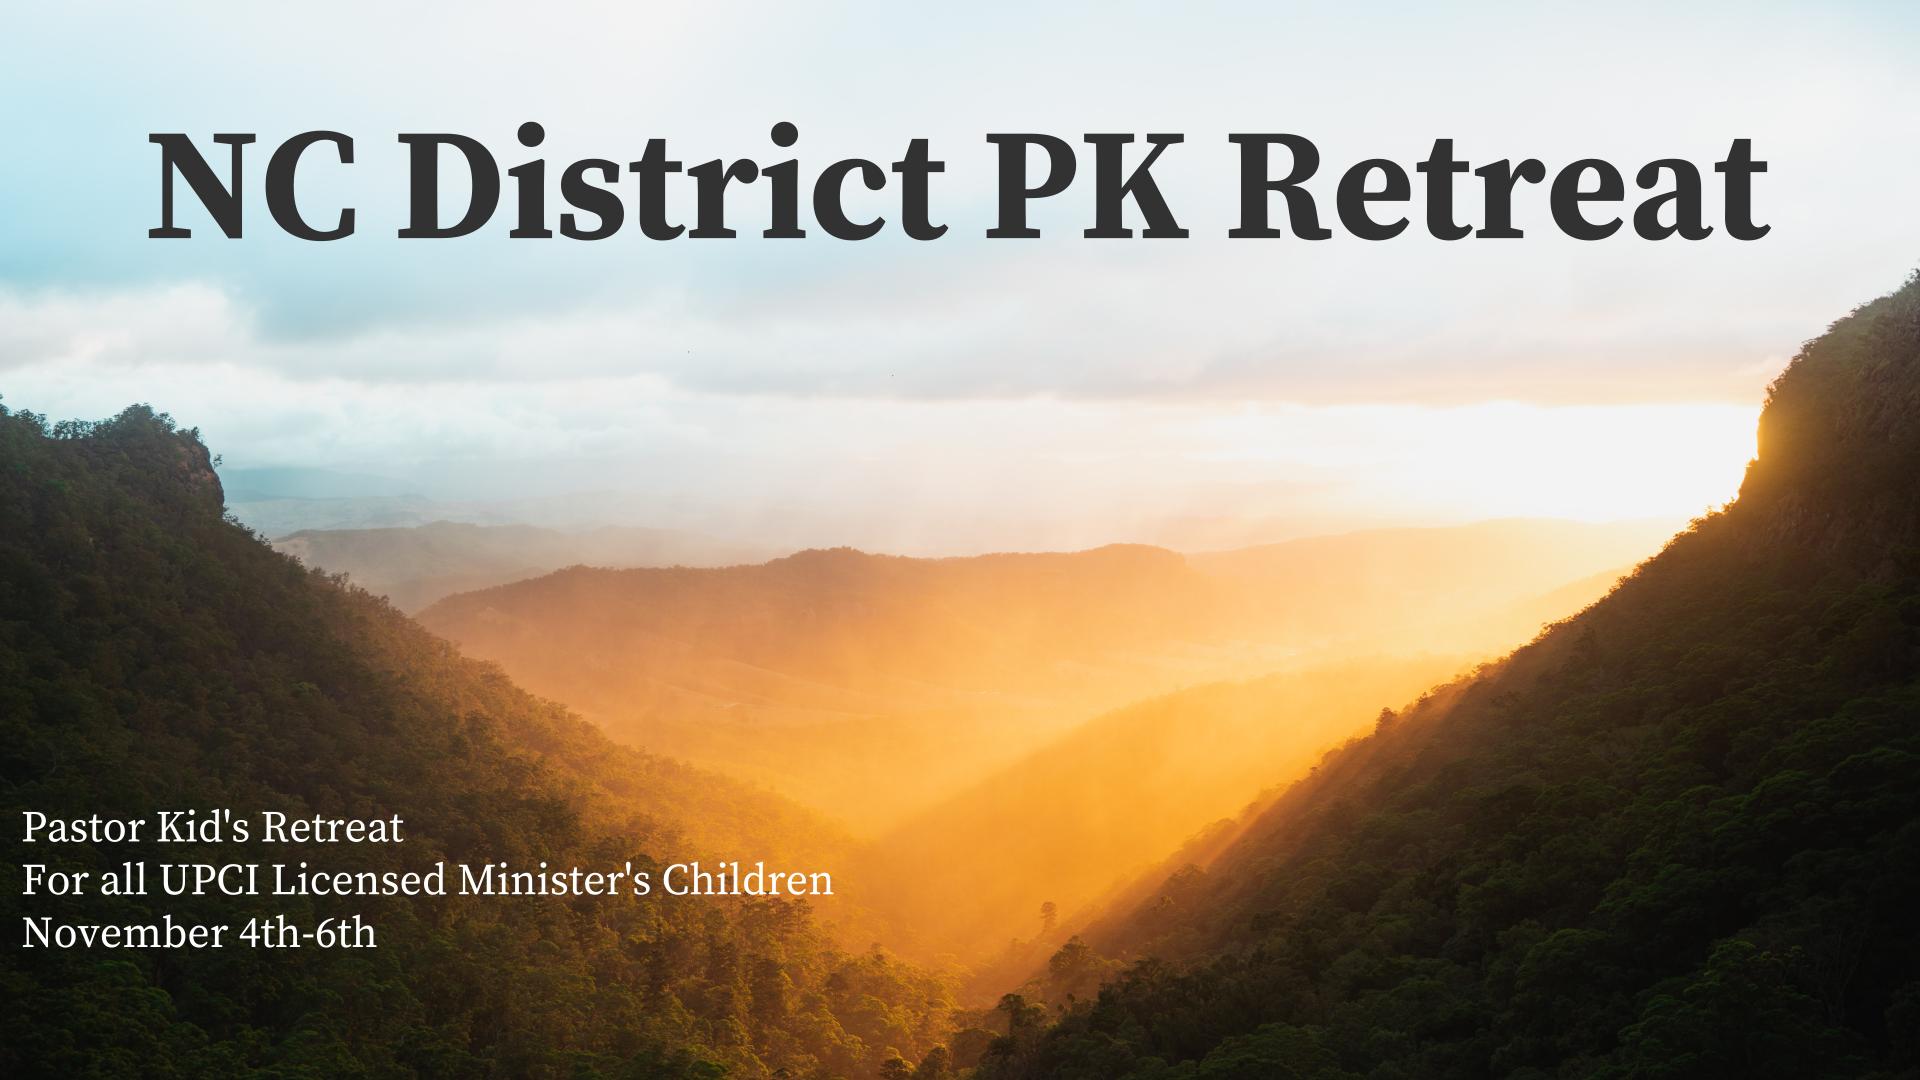 PK Retreat